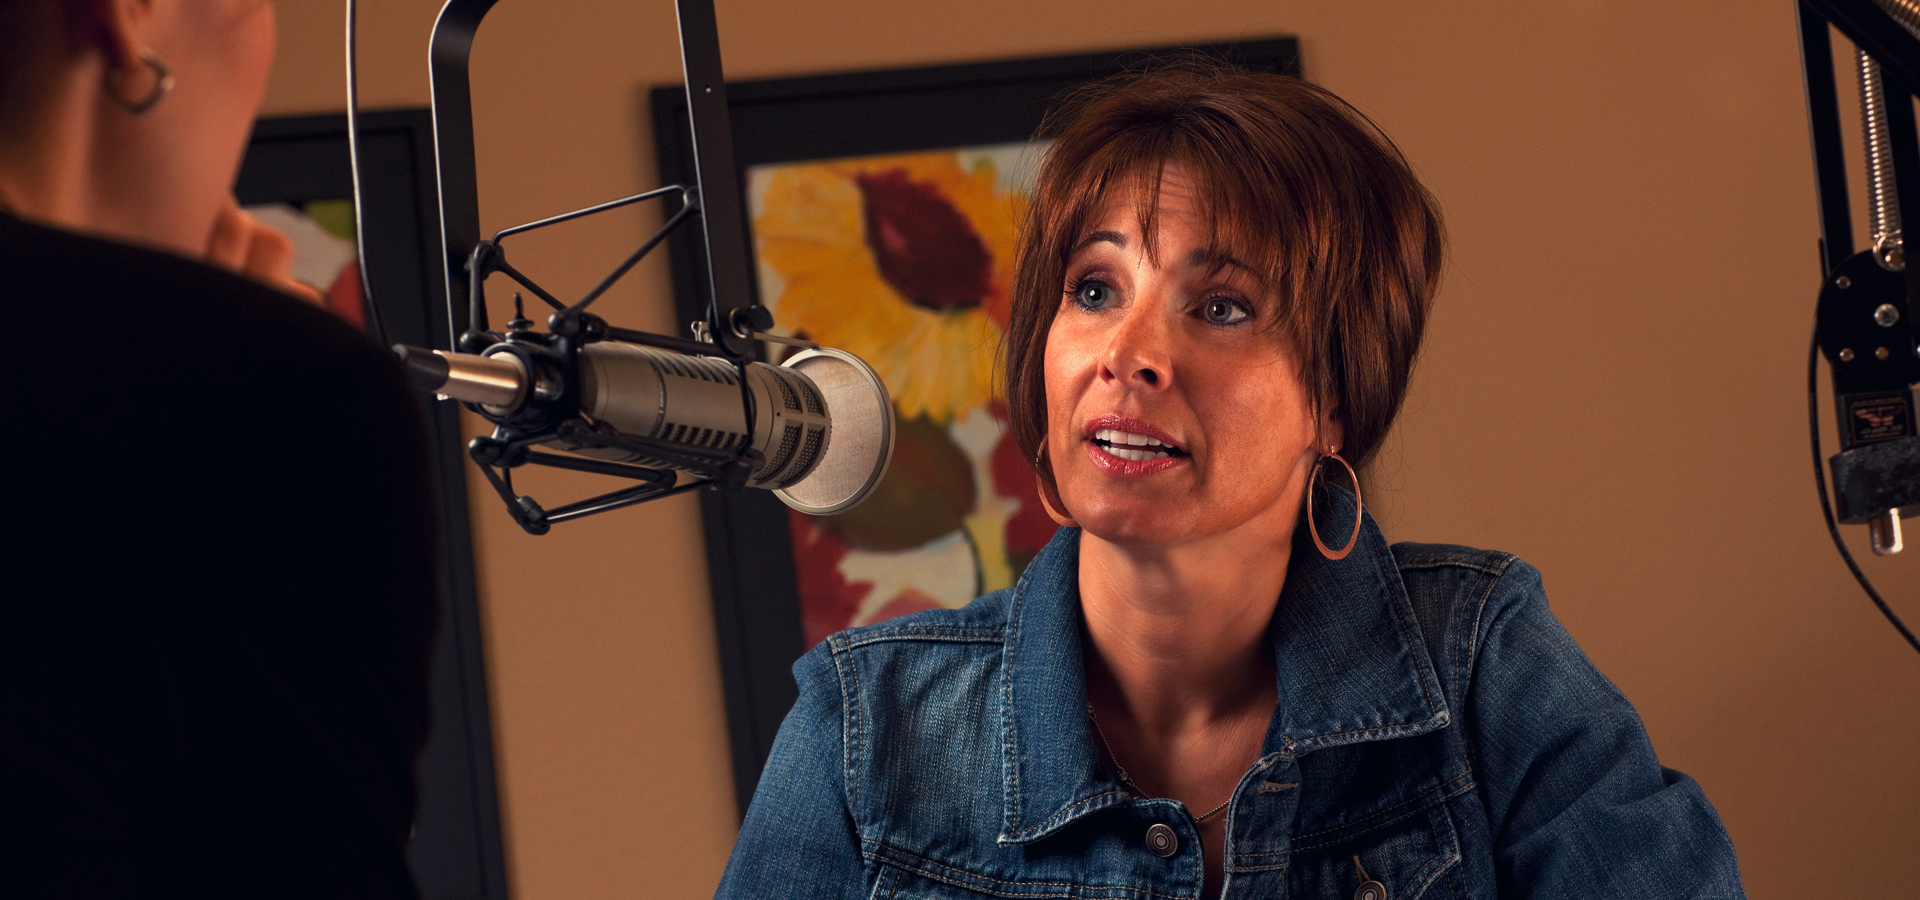 Money Strategies with Debbie - Resources